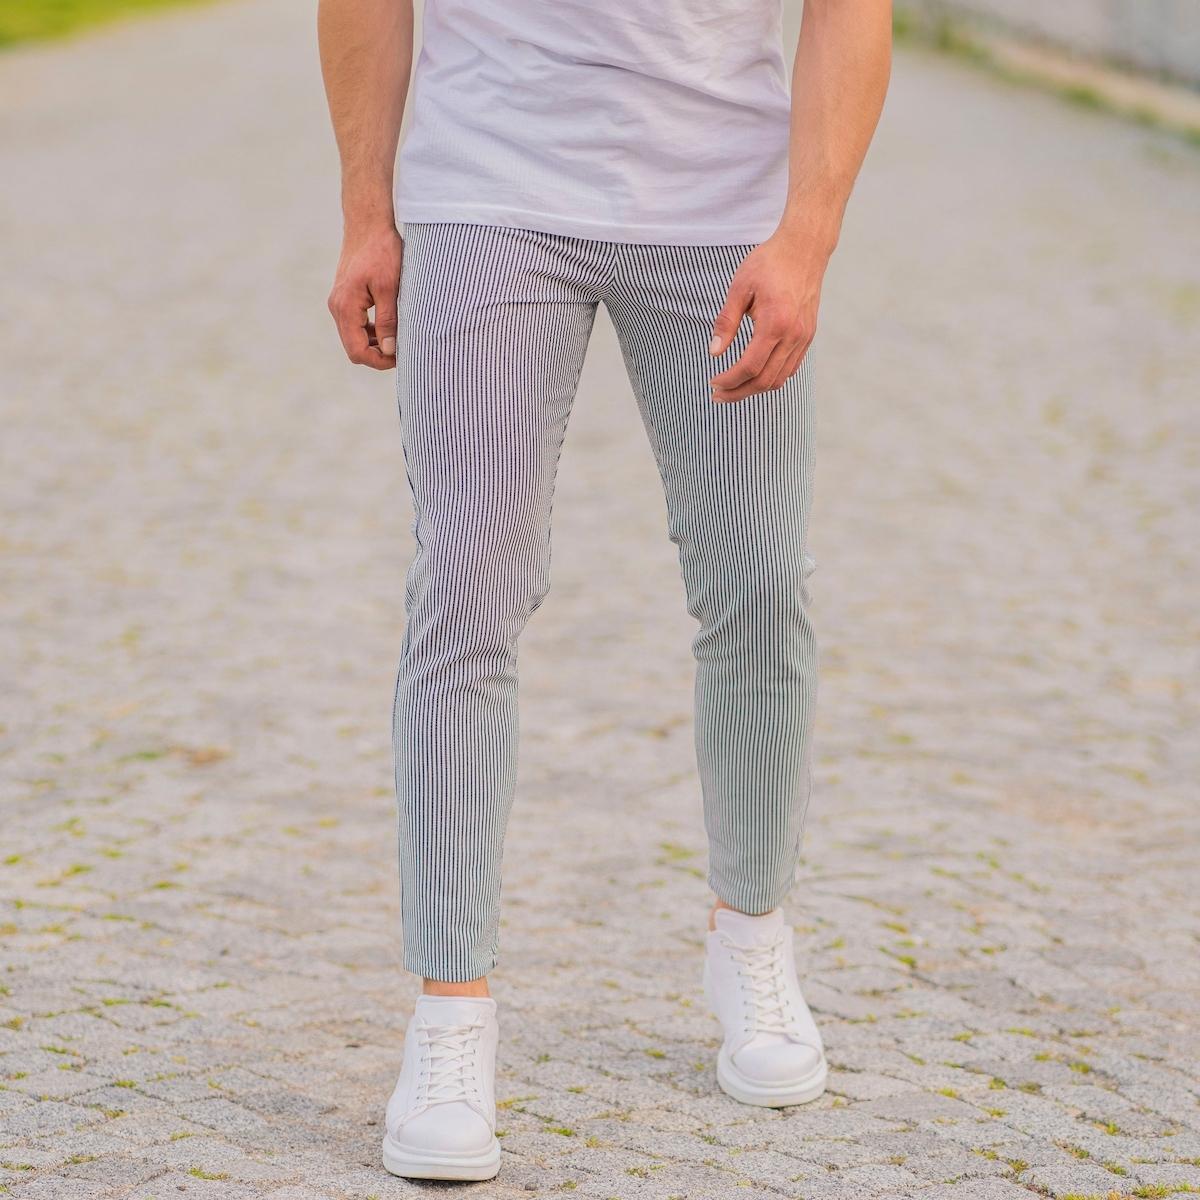 Erkek Dar Paça Fit Çizgili Beyaz Kumaş Pantolon